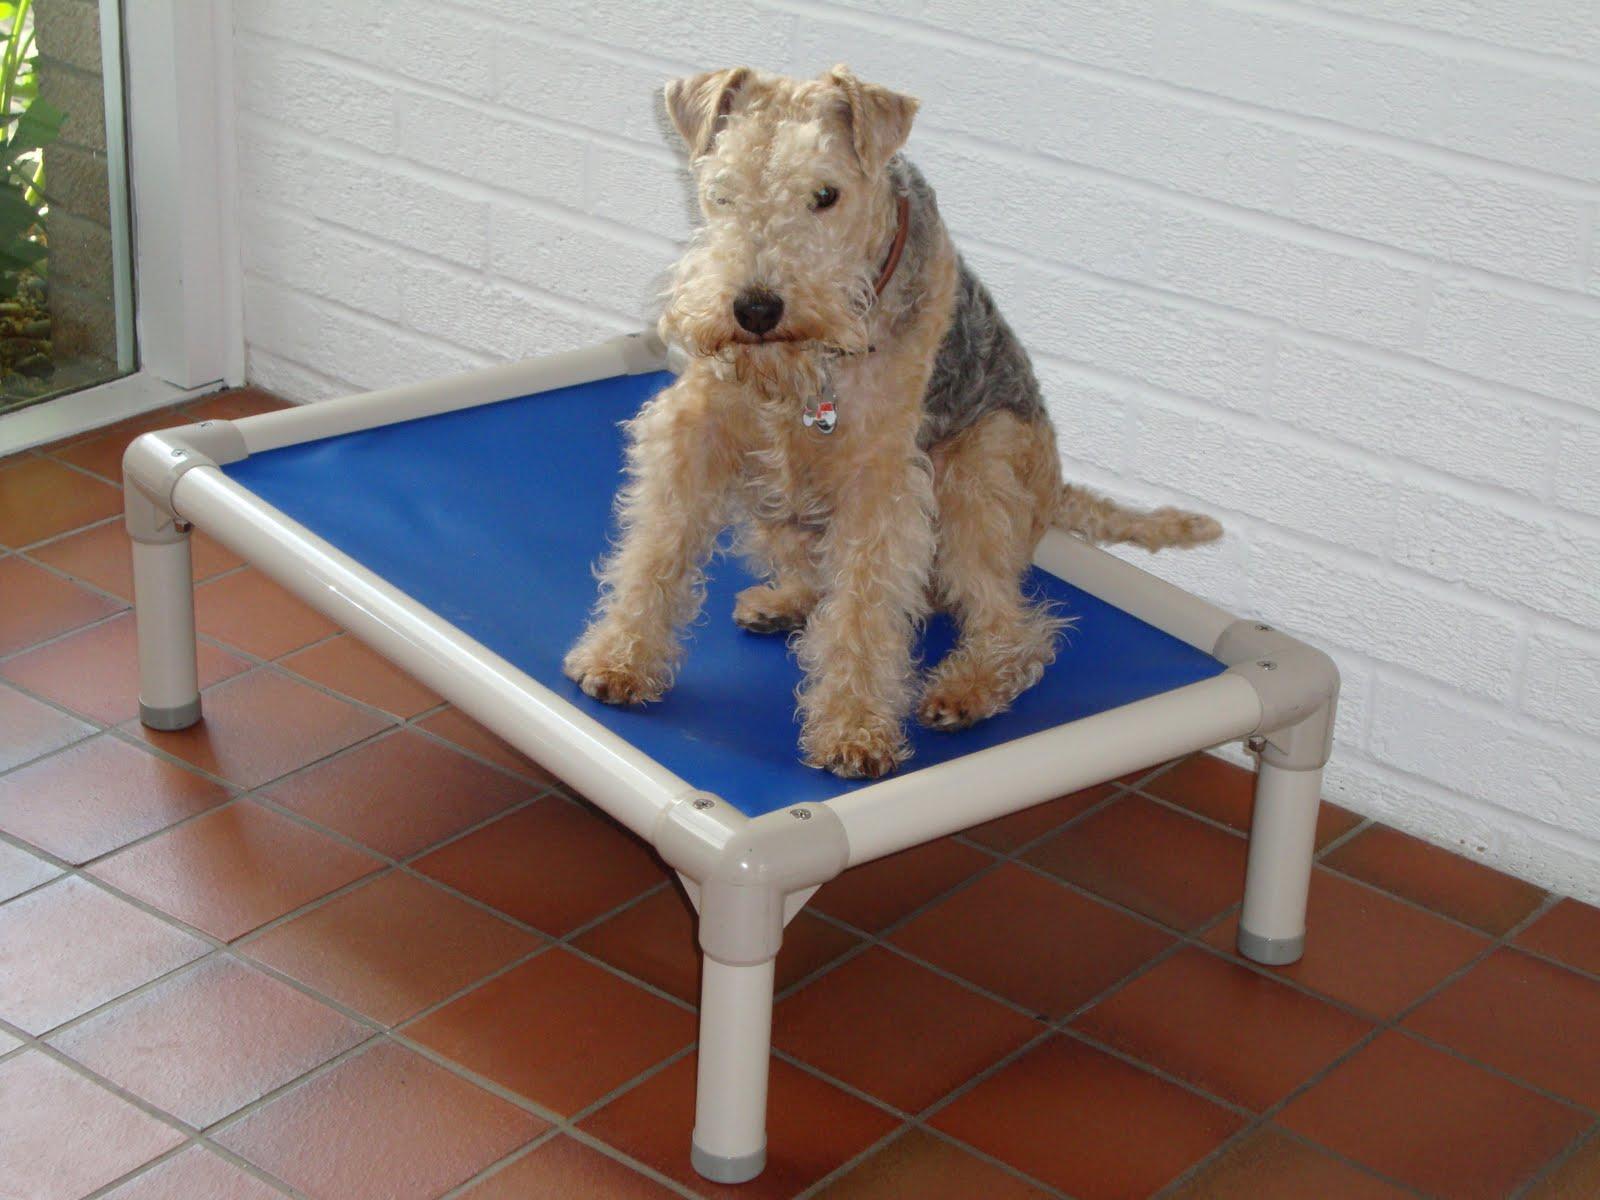 kuranda the at beds love bed fence dog